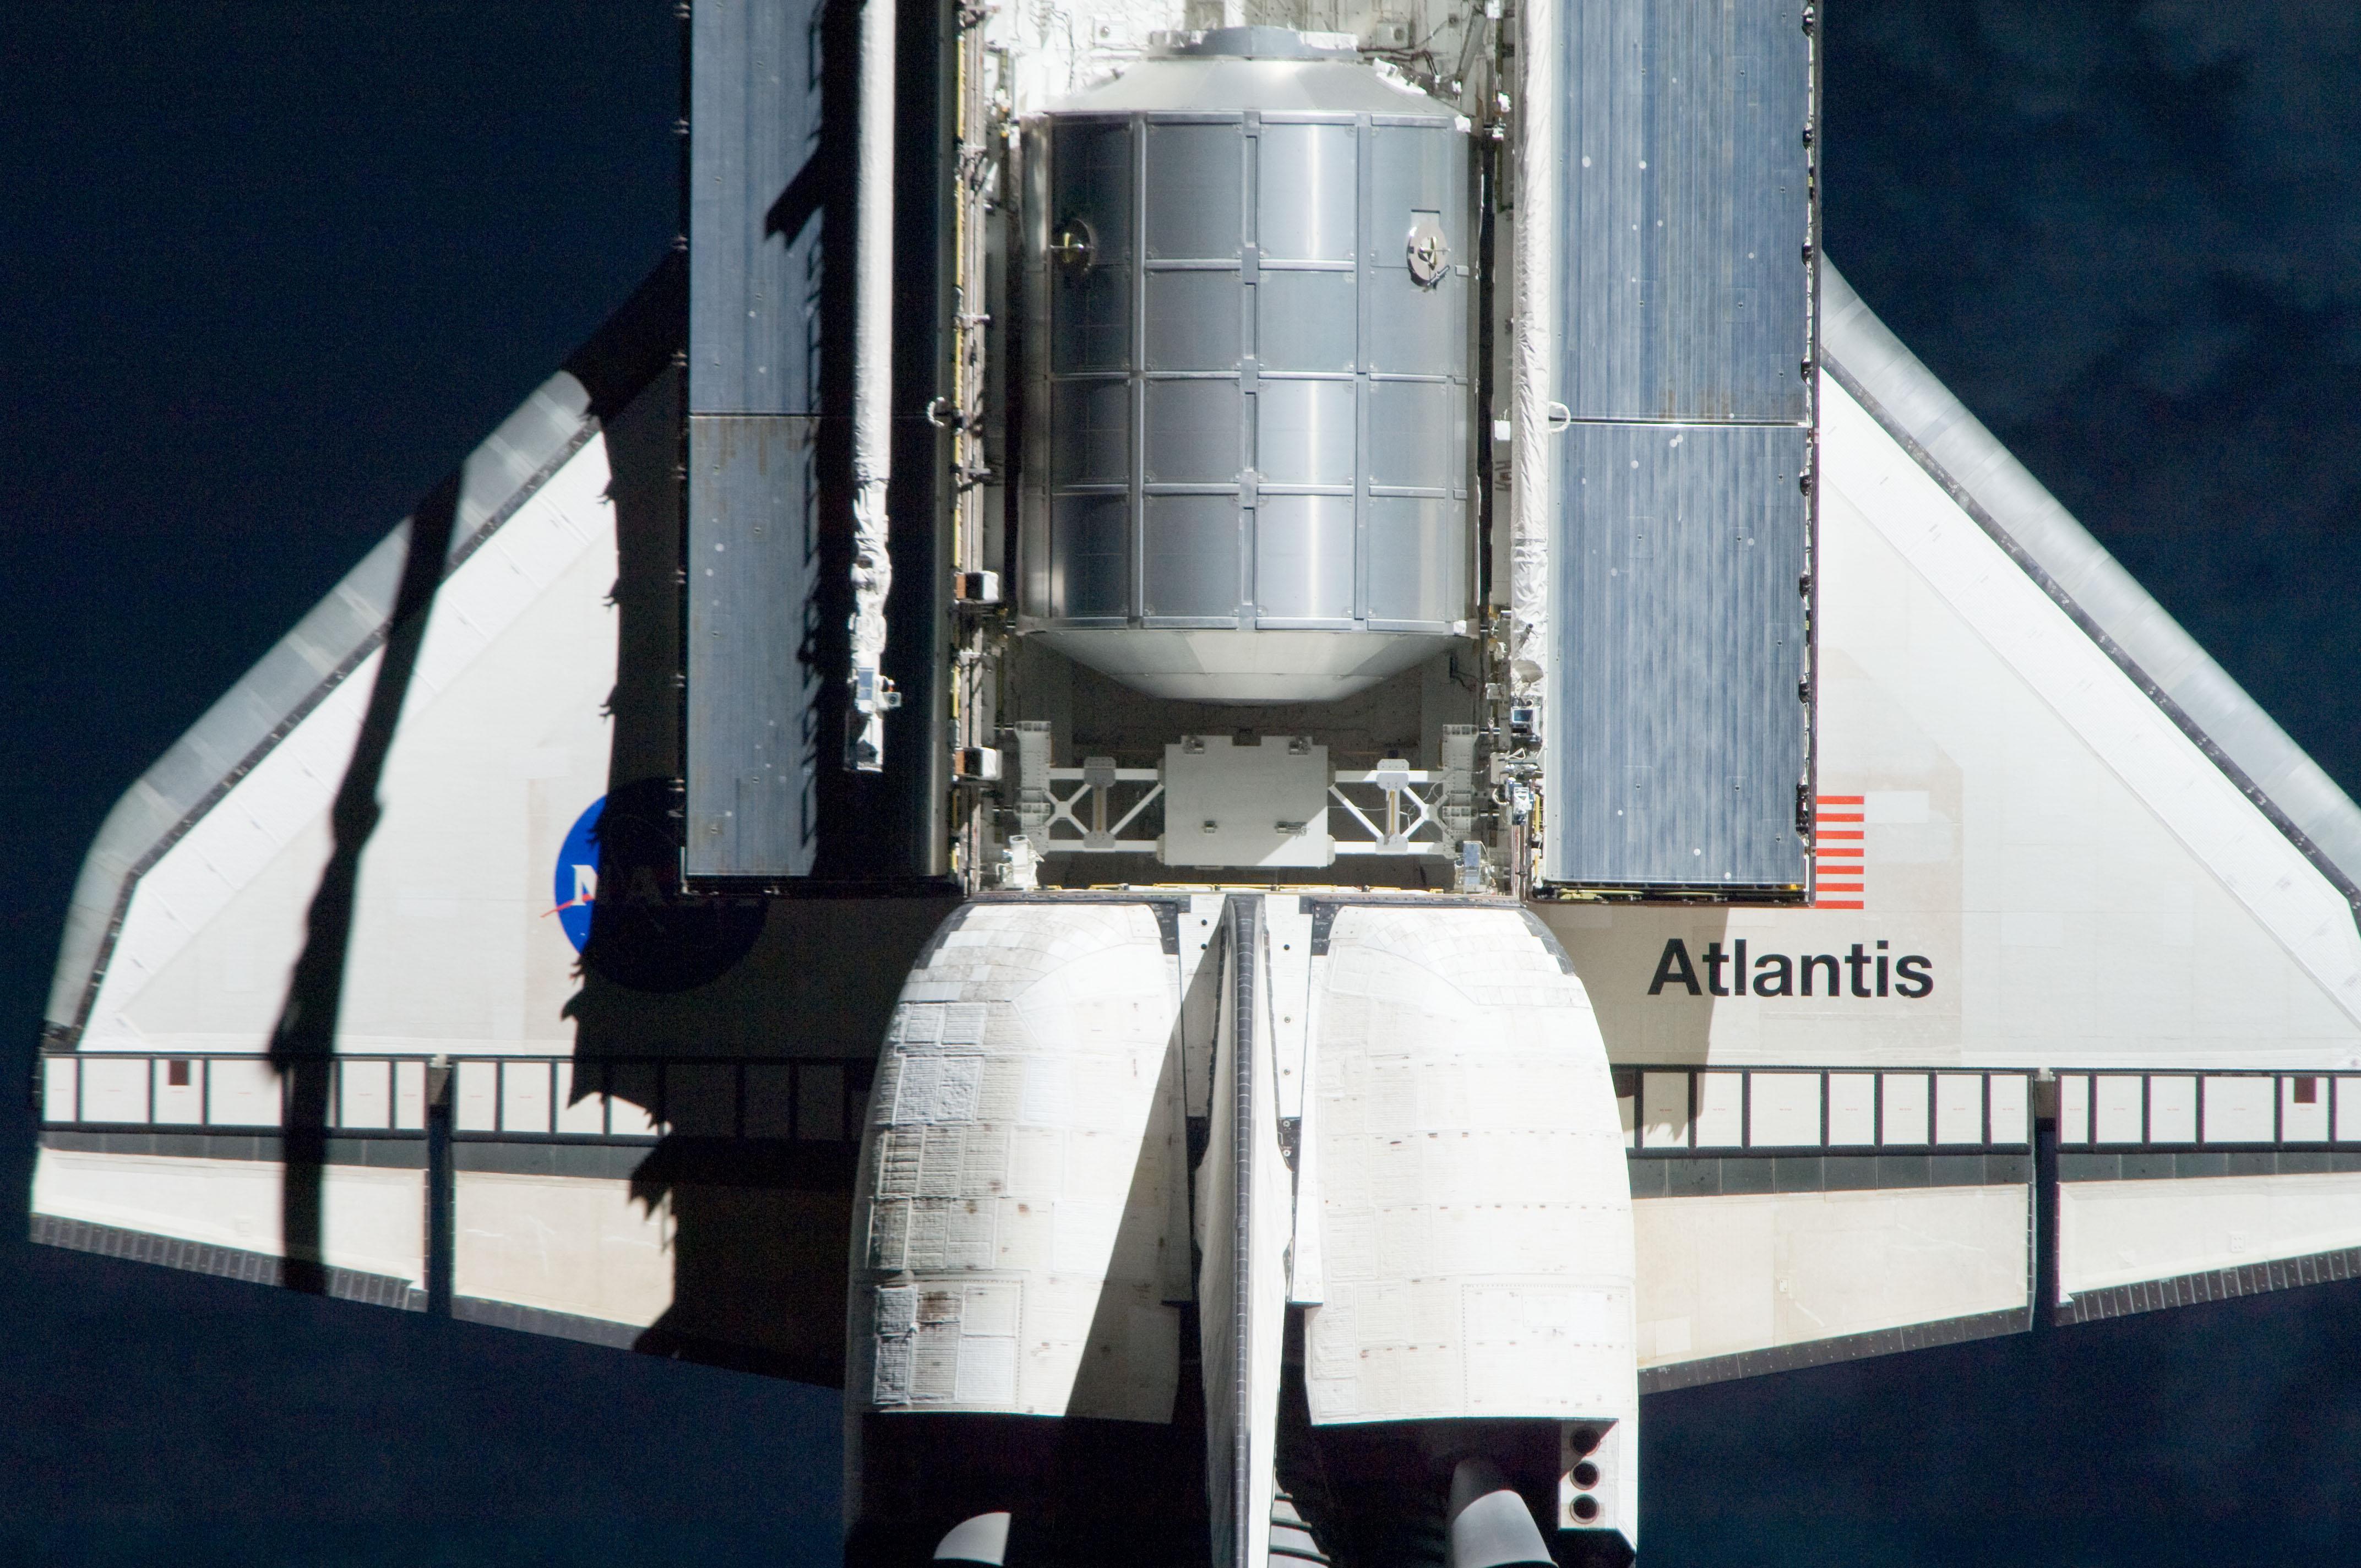 space shuttle atlantis purpose - photo #11